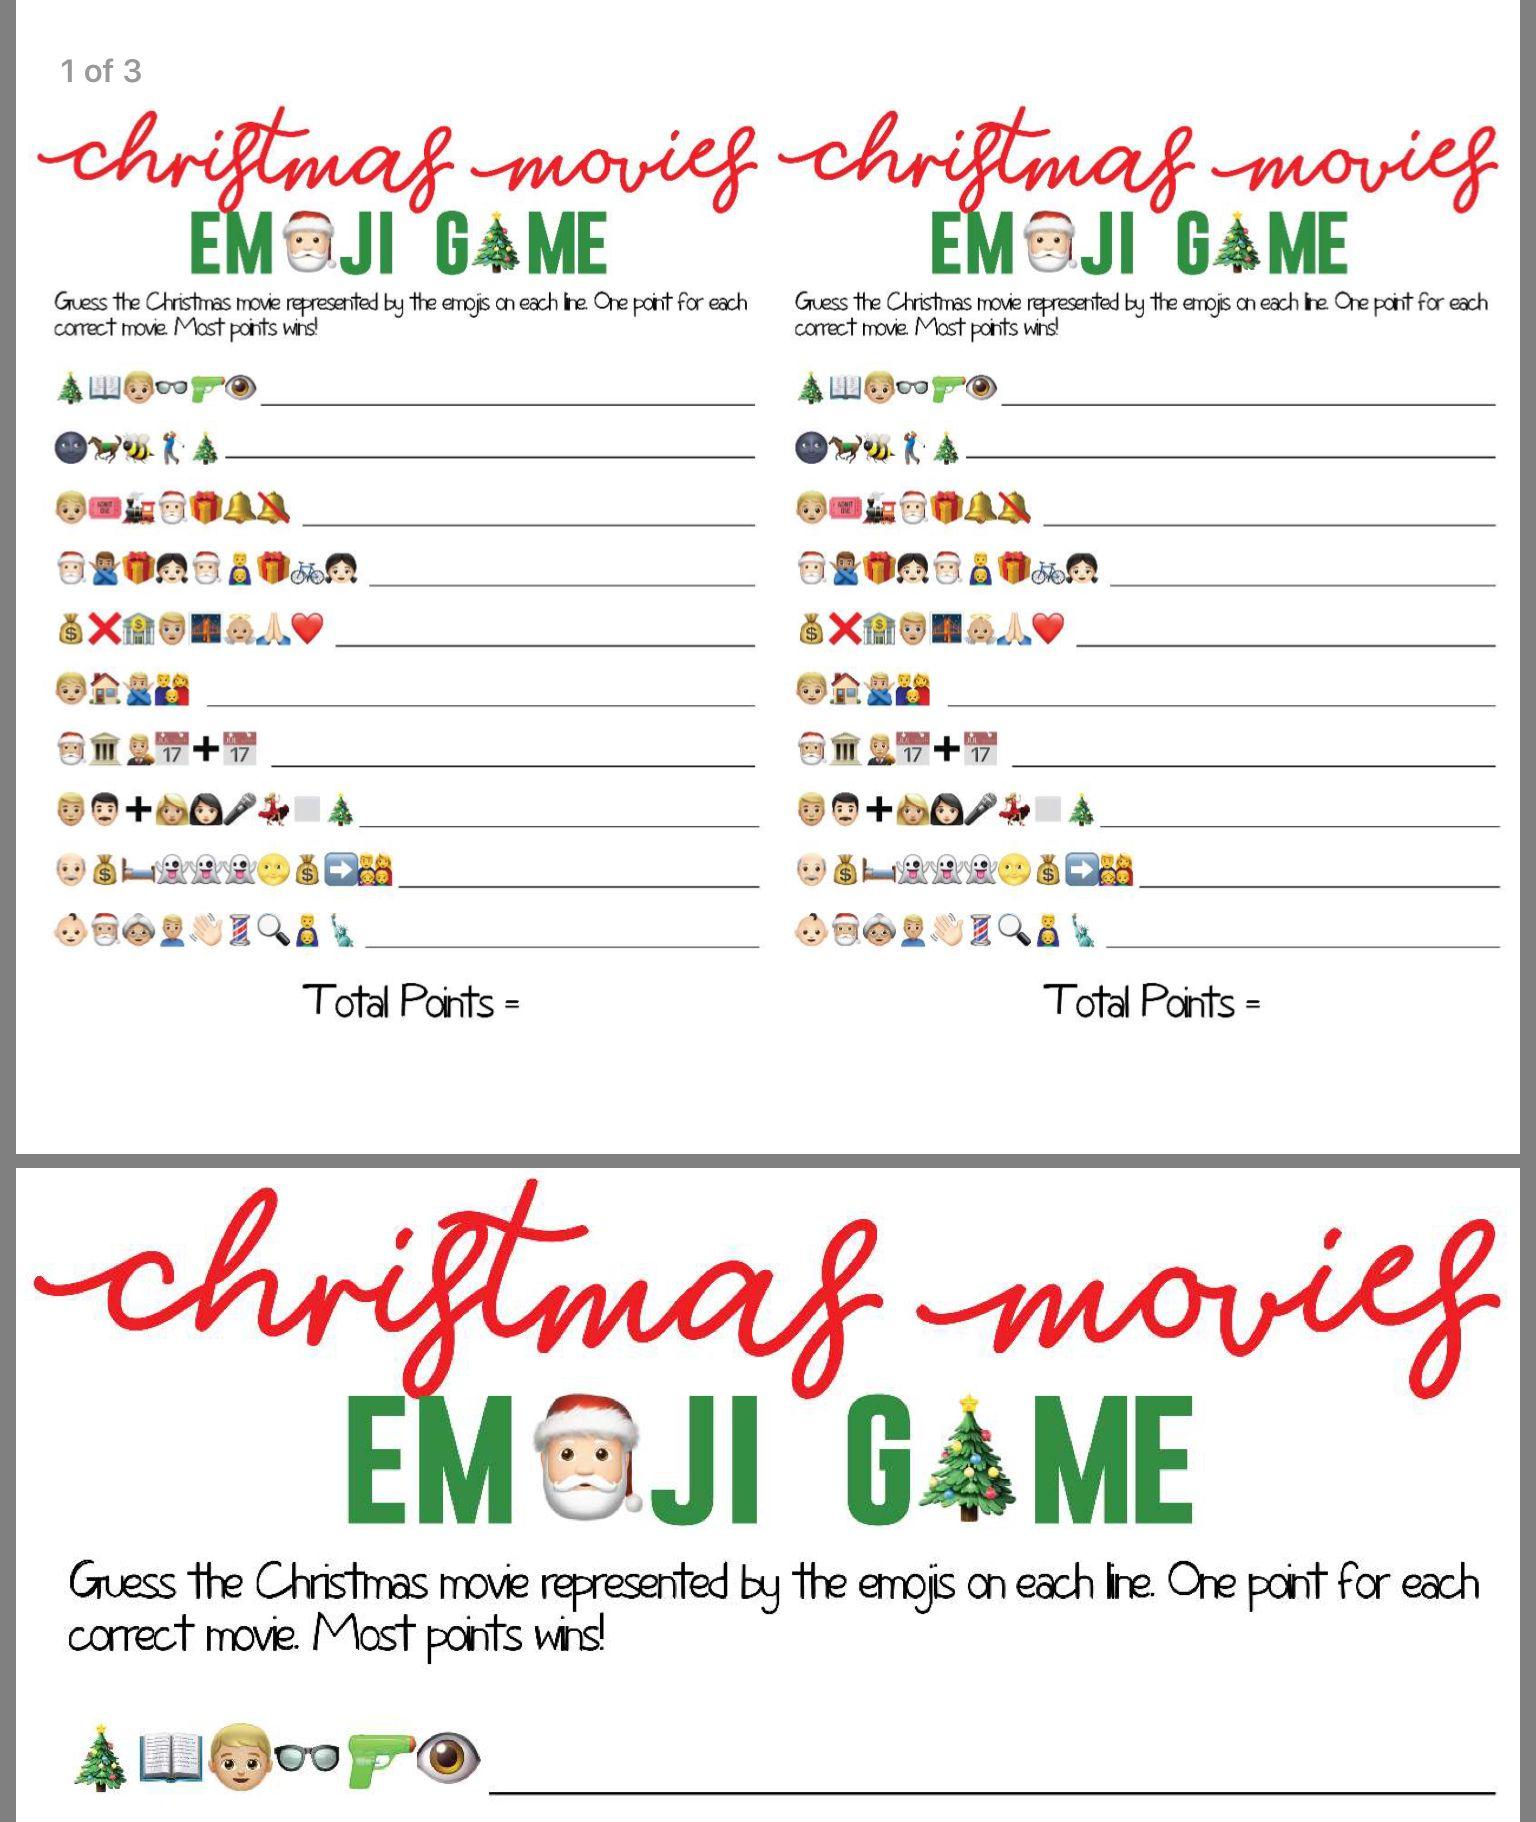 Pin By Kim Dalglish On Christmas Emoji Games Christmas Games Christmas Movies